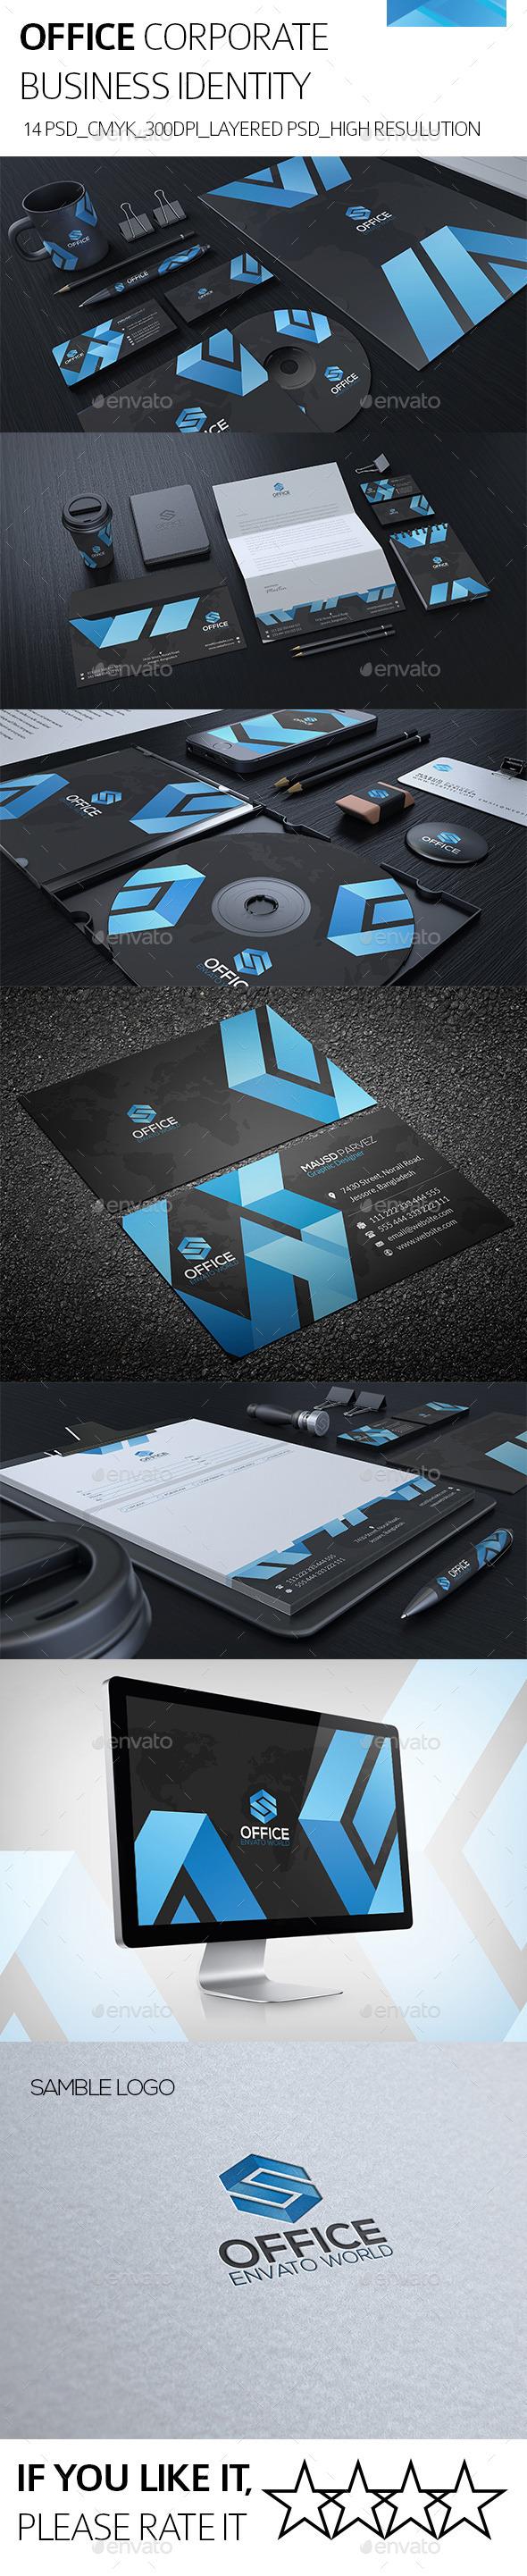 GraphicRiver Office Corporate Identity 8823627